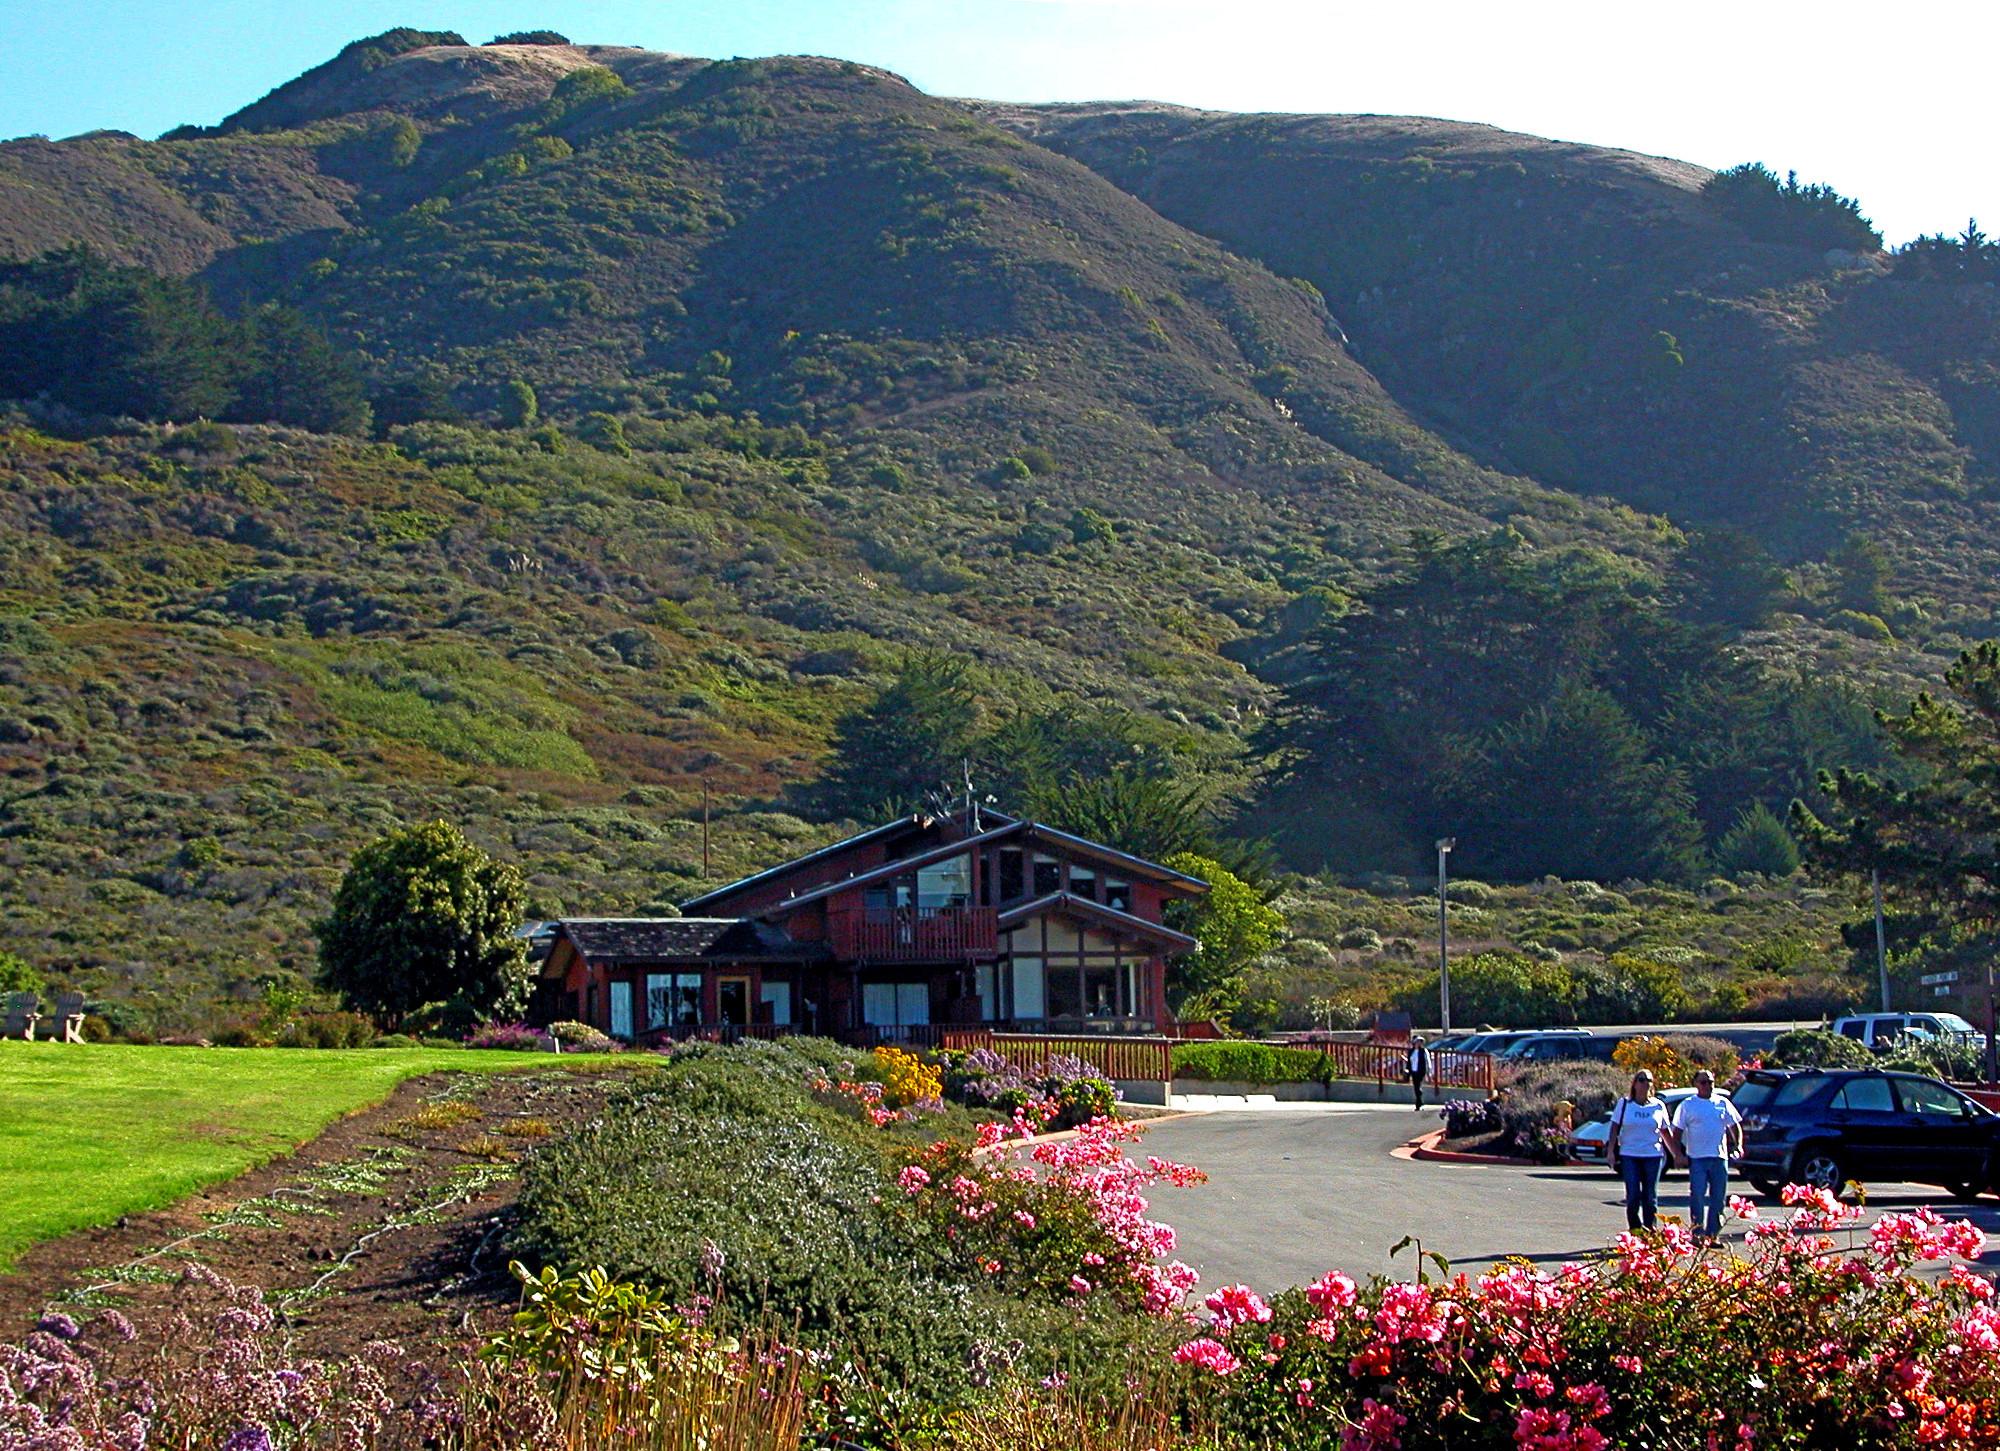 Ragged Point Inn & Resort on California